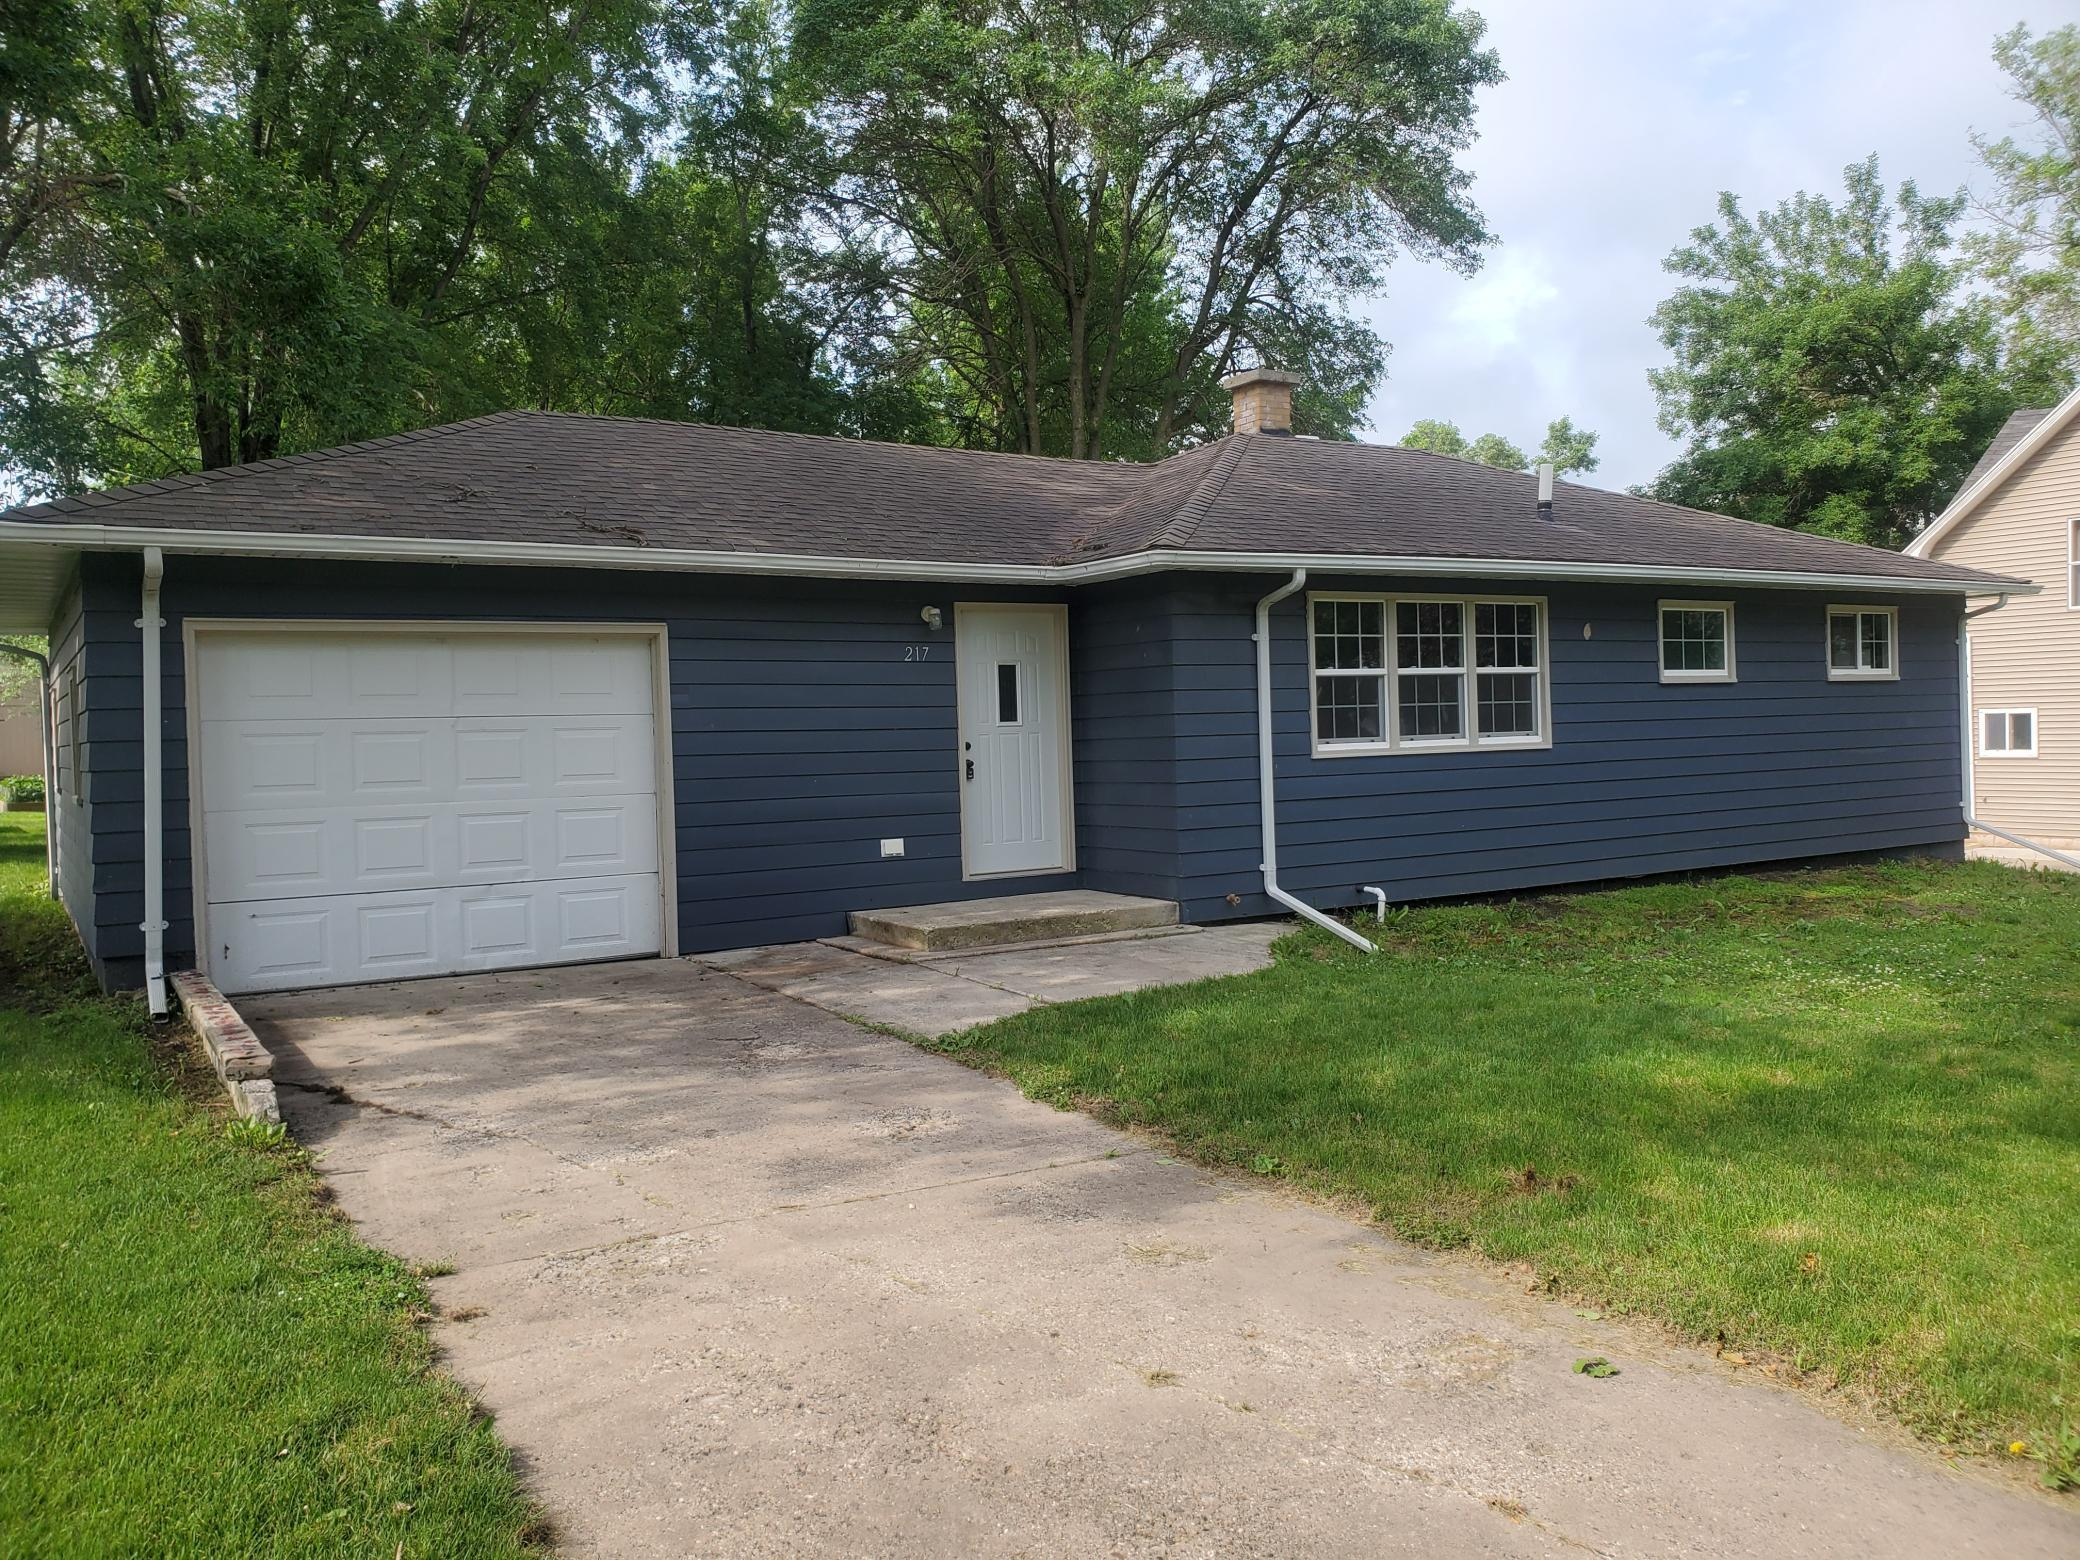 217 6th E Property Photo - Jasper, MN real estate listing